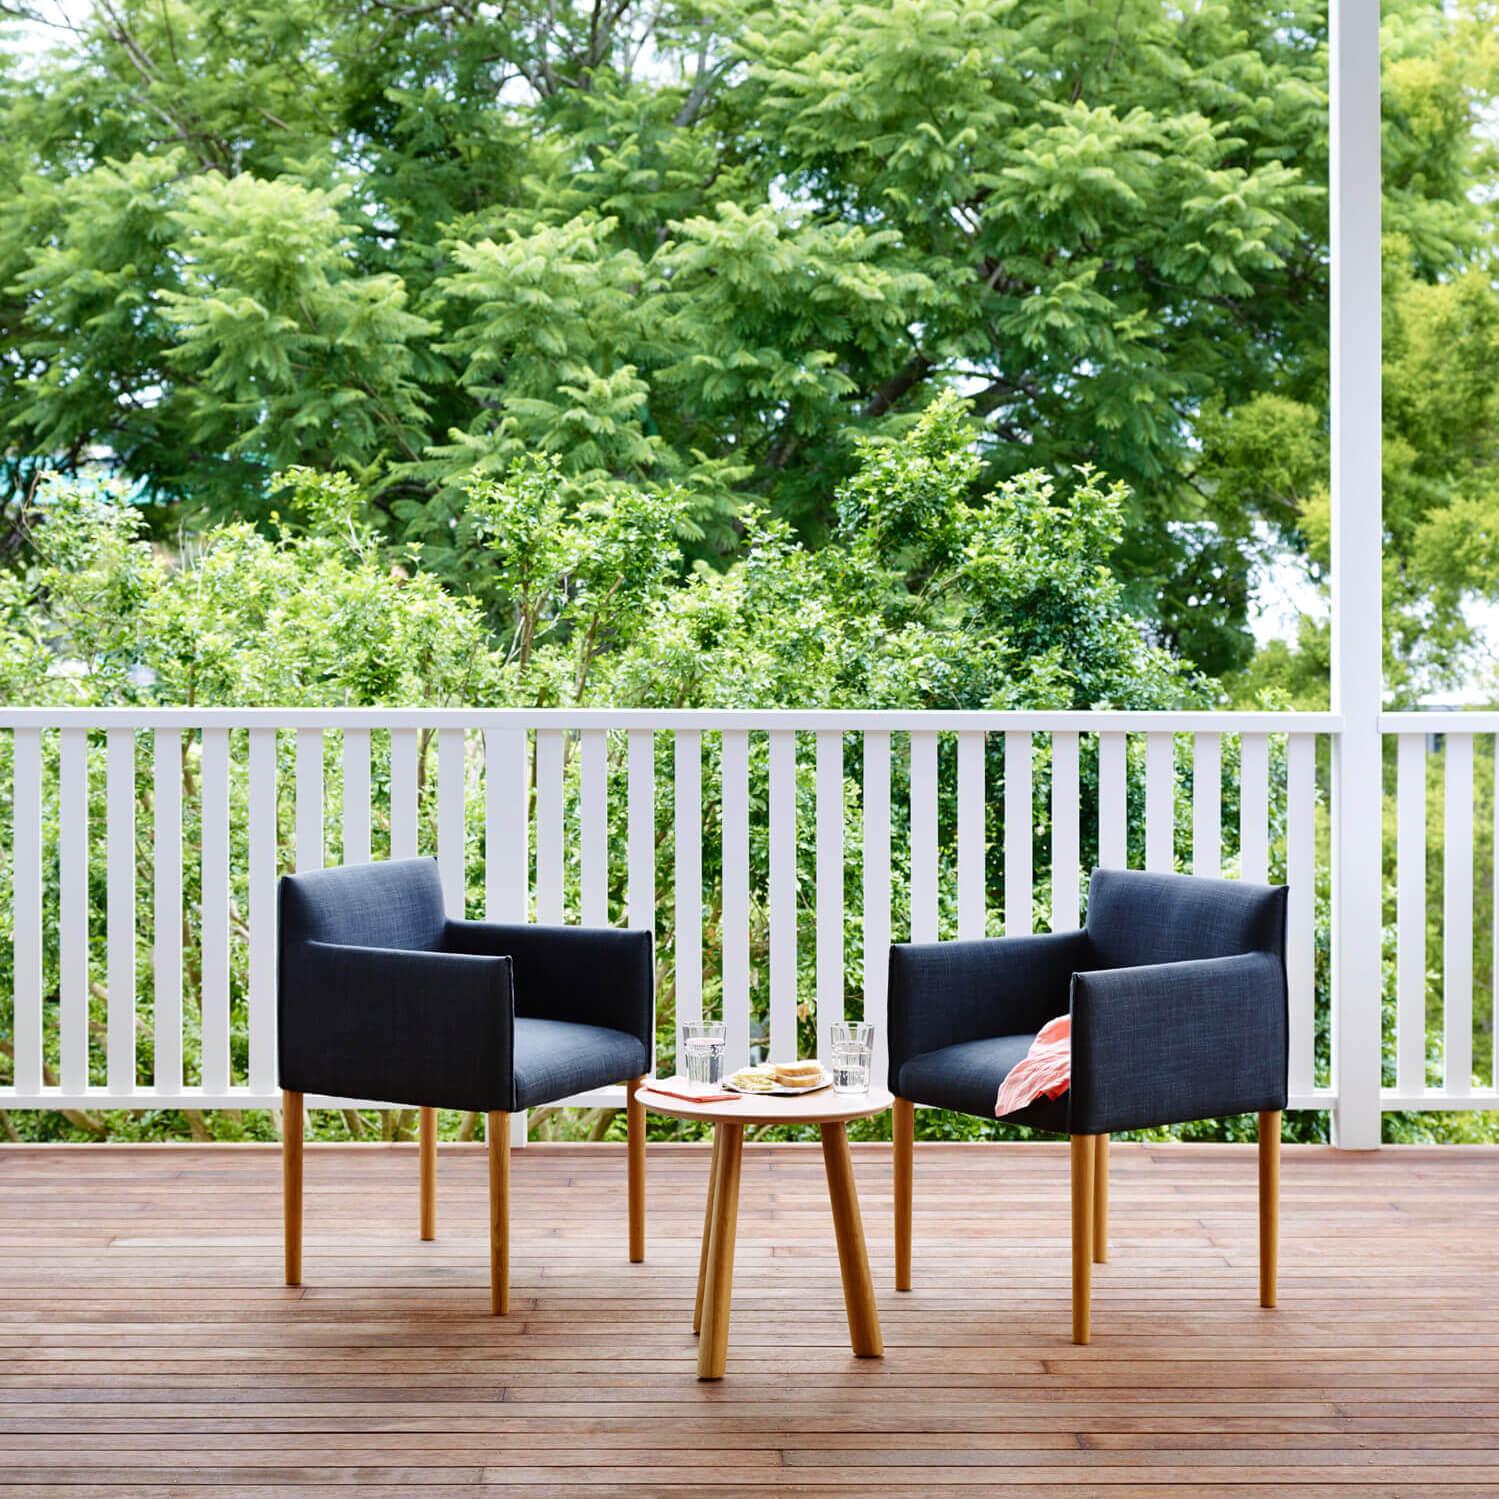 georgia-cannon-interior-designer-brisbane-project-m2-house-017082-crop.jpg